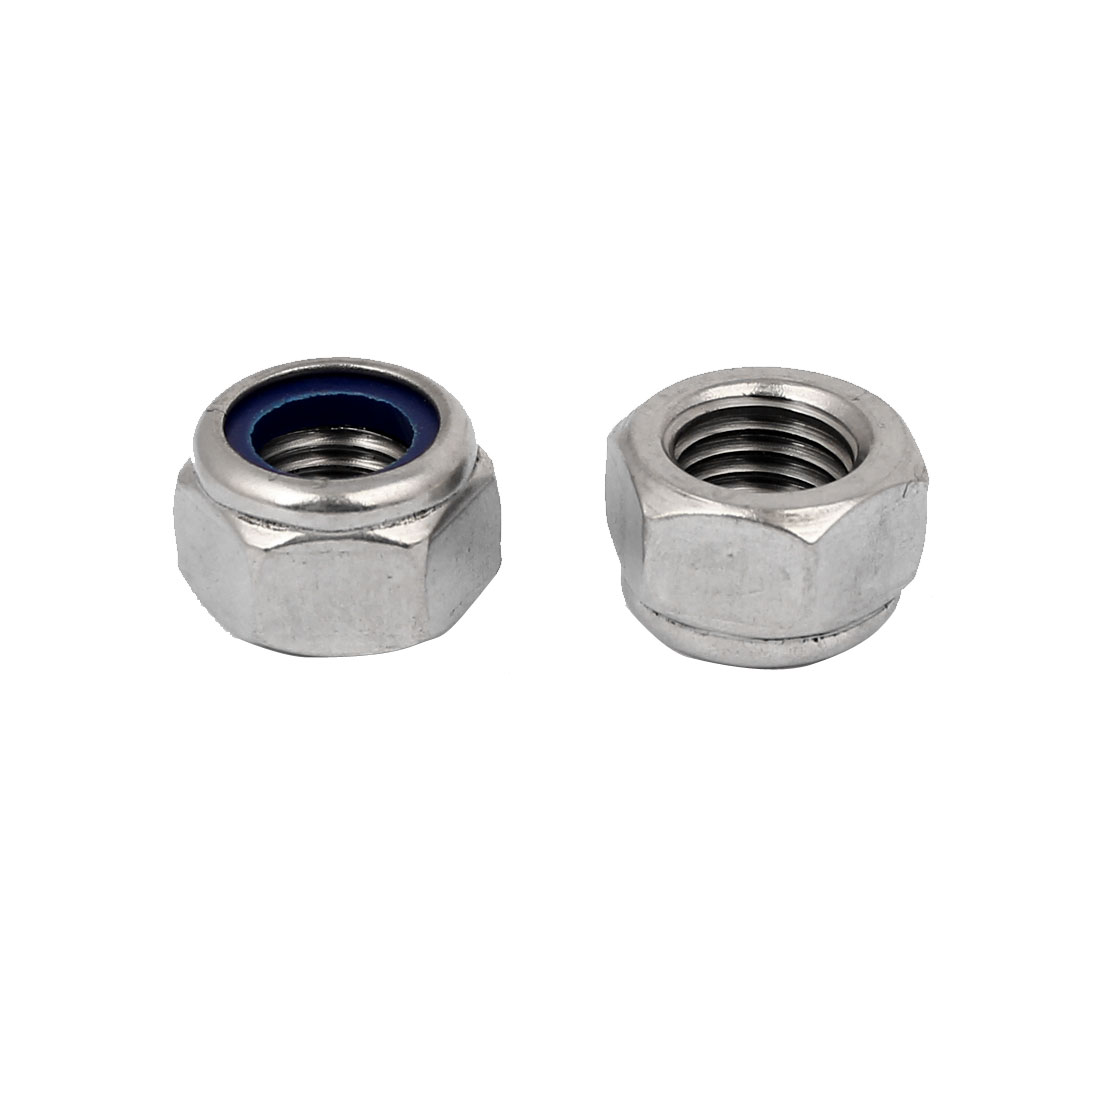 304 Stainless Steel Nylock Nylon Insert Hex Lock Nuts Silver Tone M18 2pcs